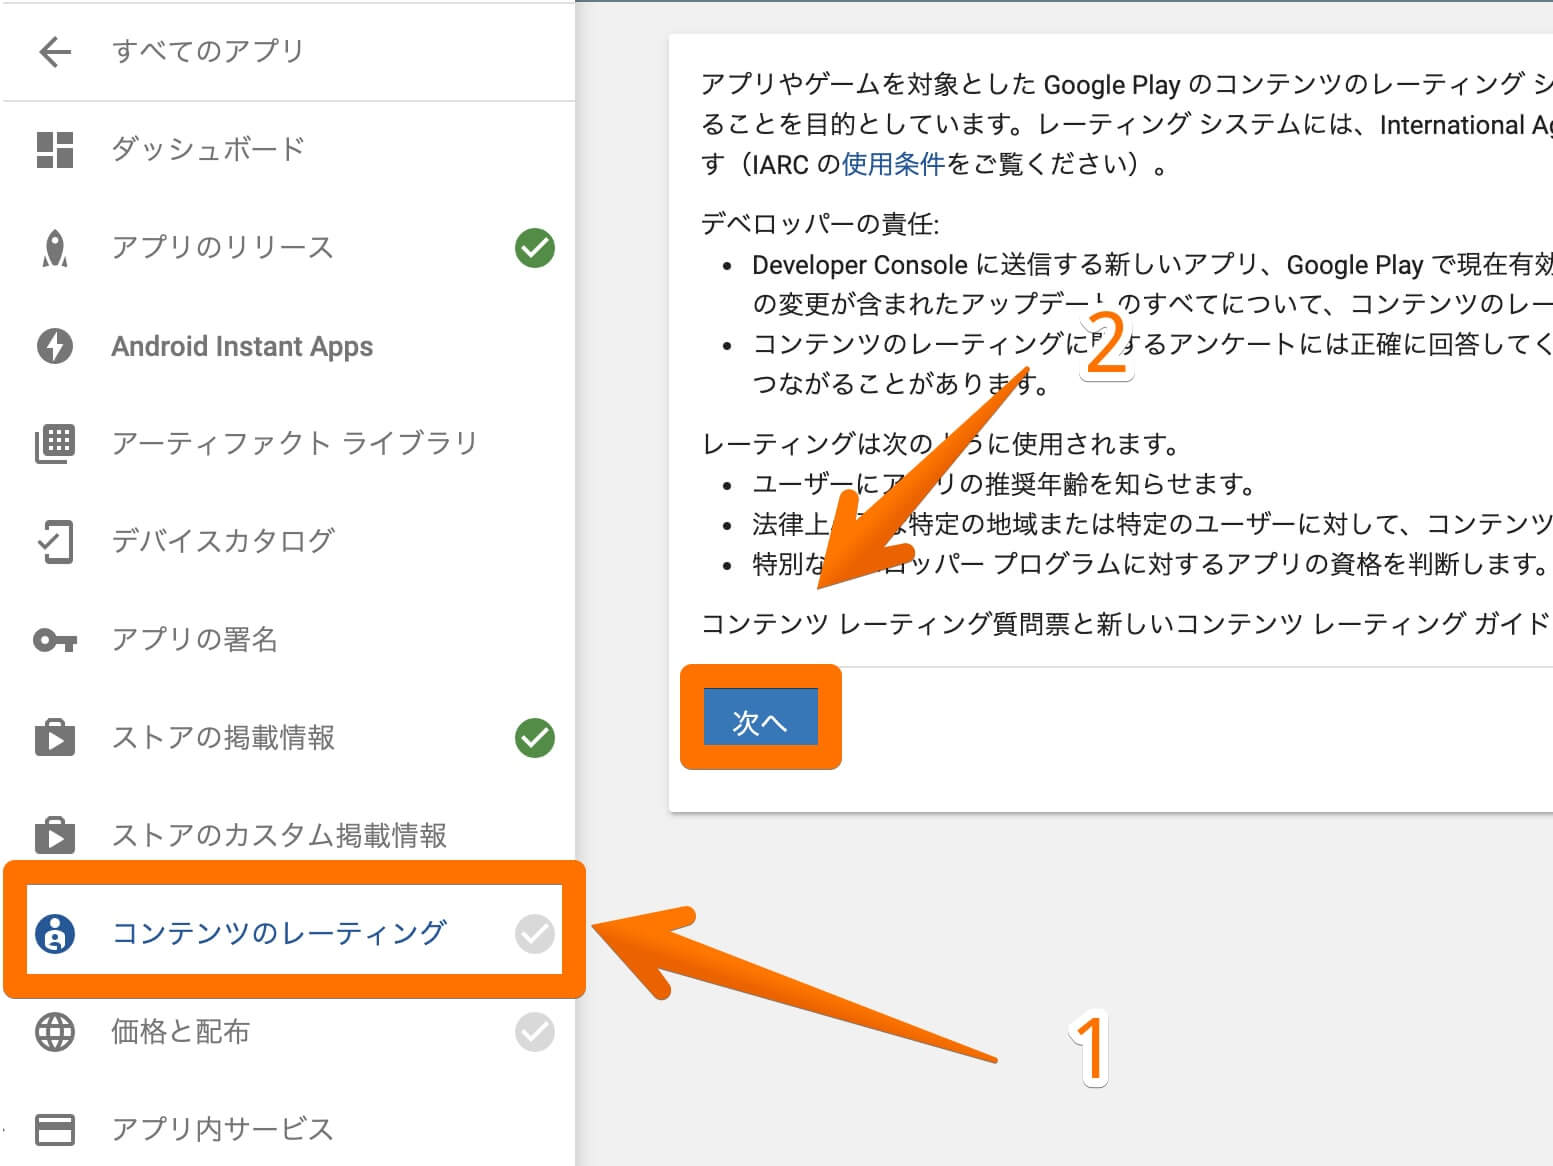 Google-Play-Consoleでコンテンツレーティングを押す